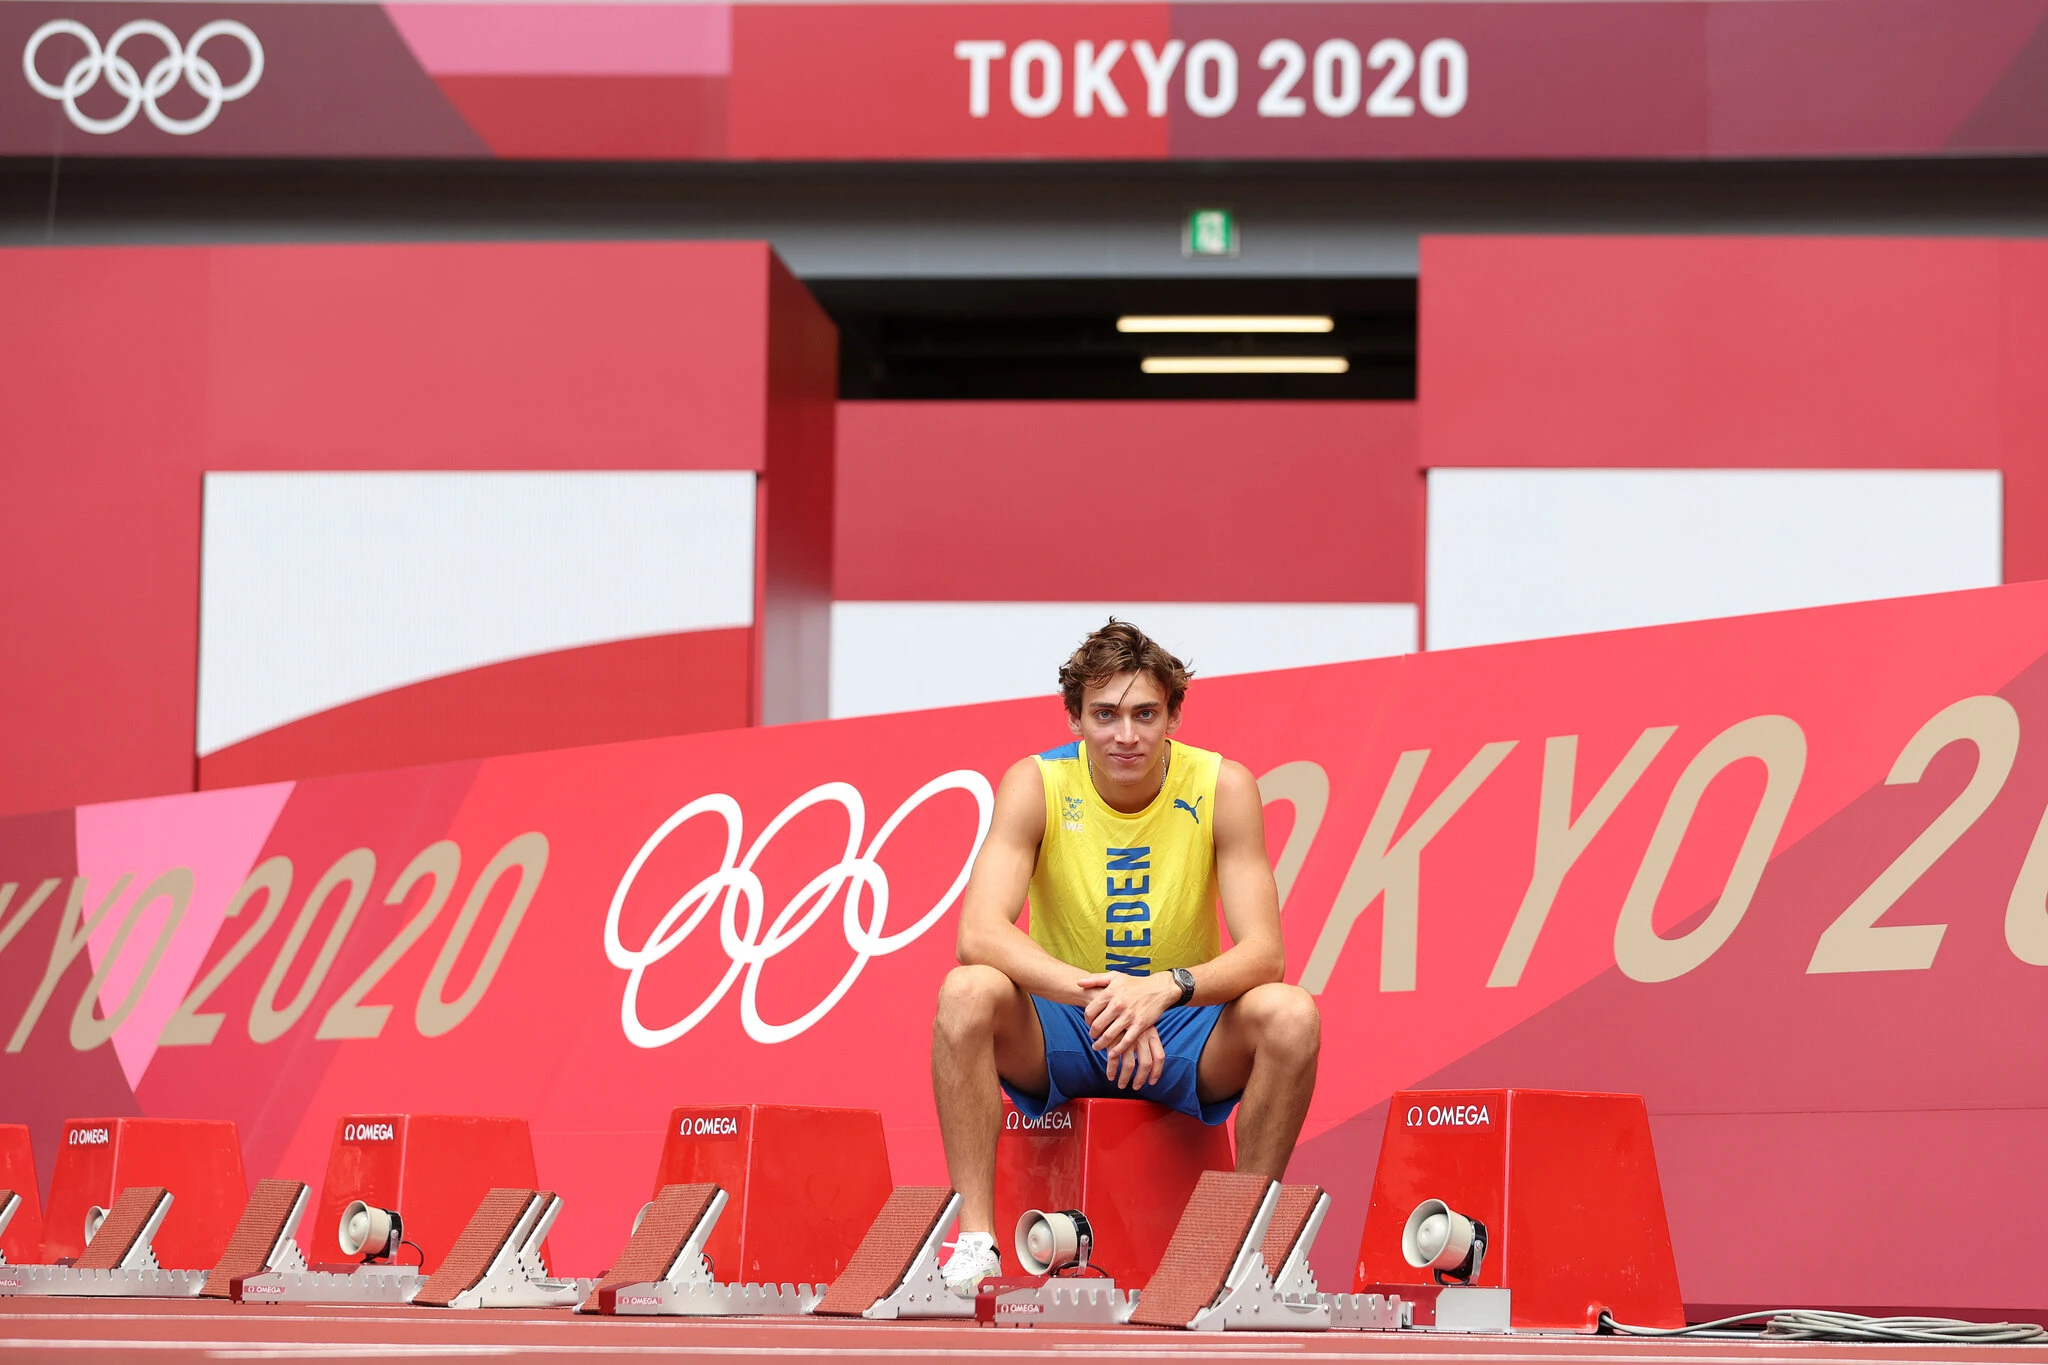 Mondo Duplantis at Tokyo Olympics 2020 with Omega on wrist